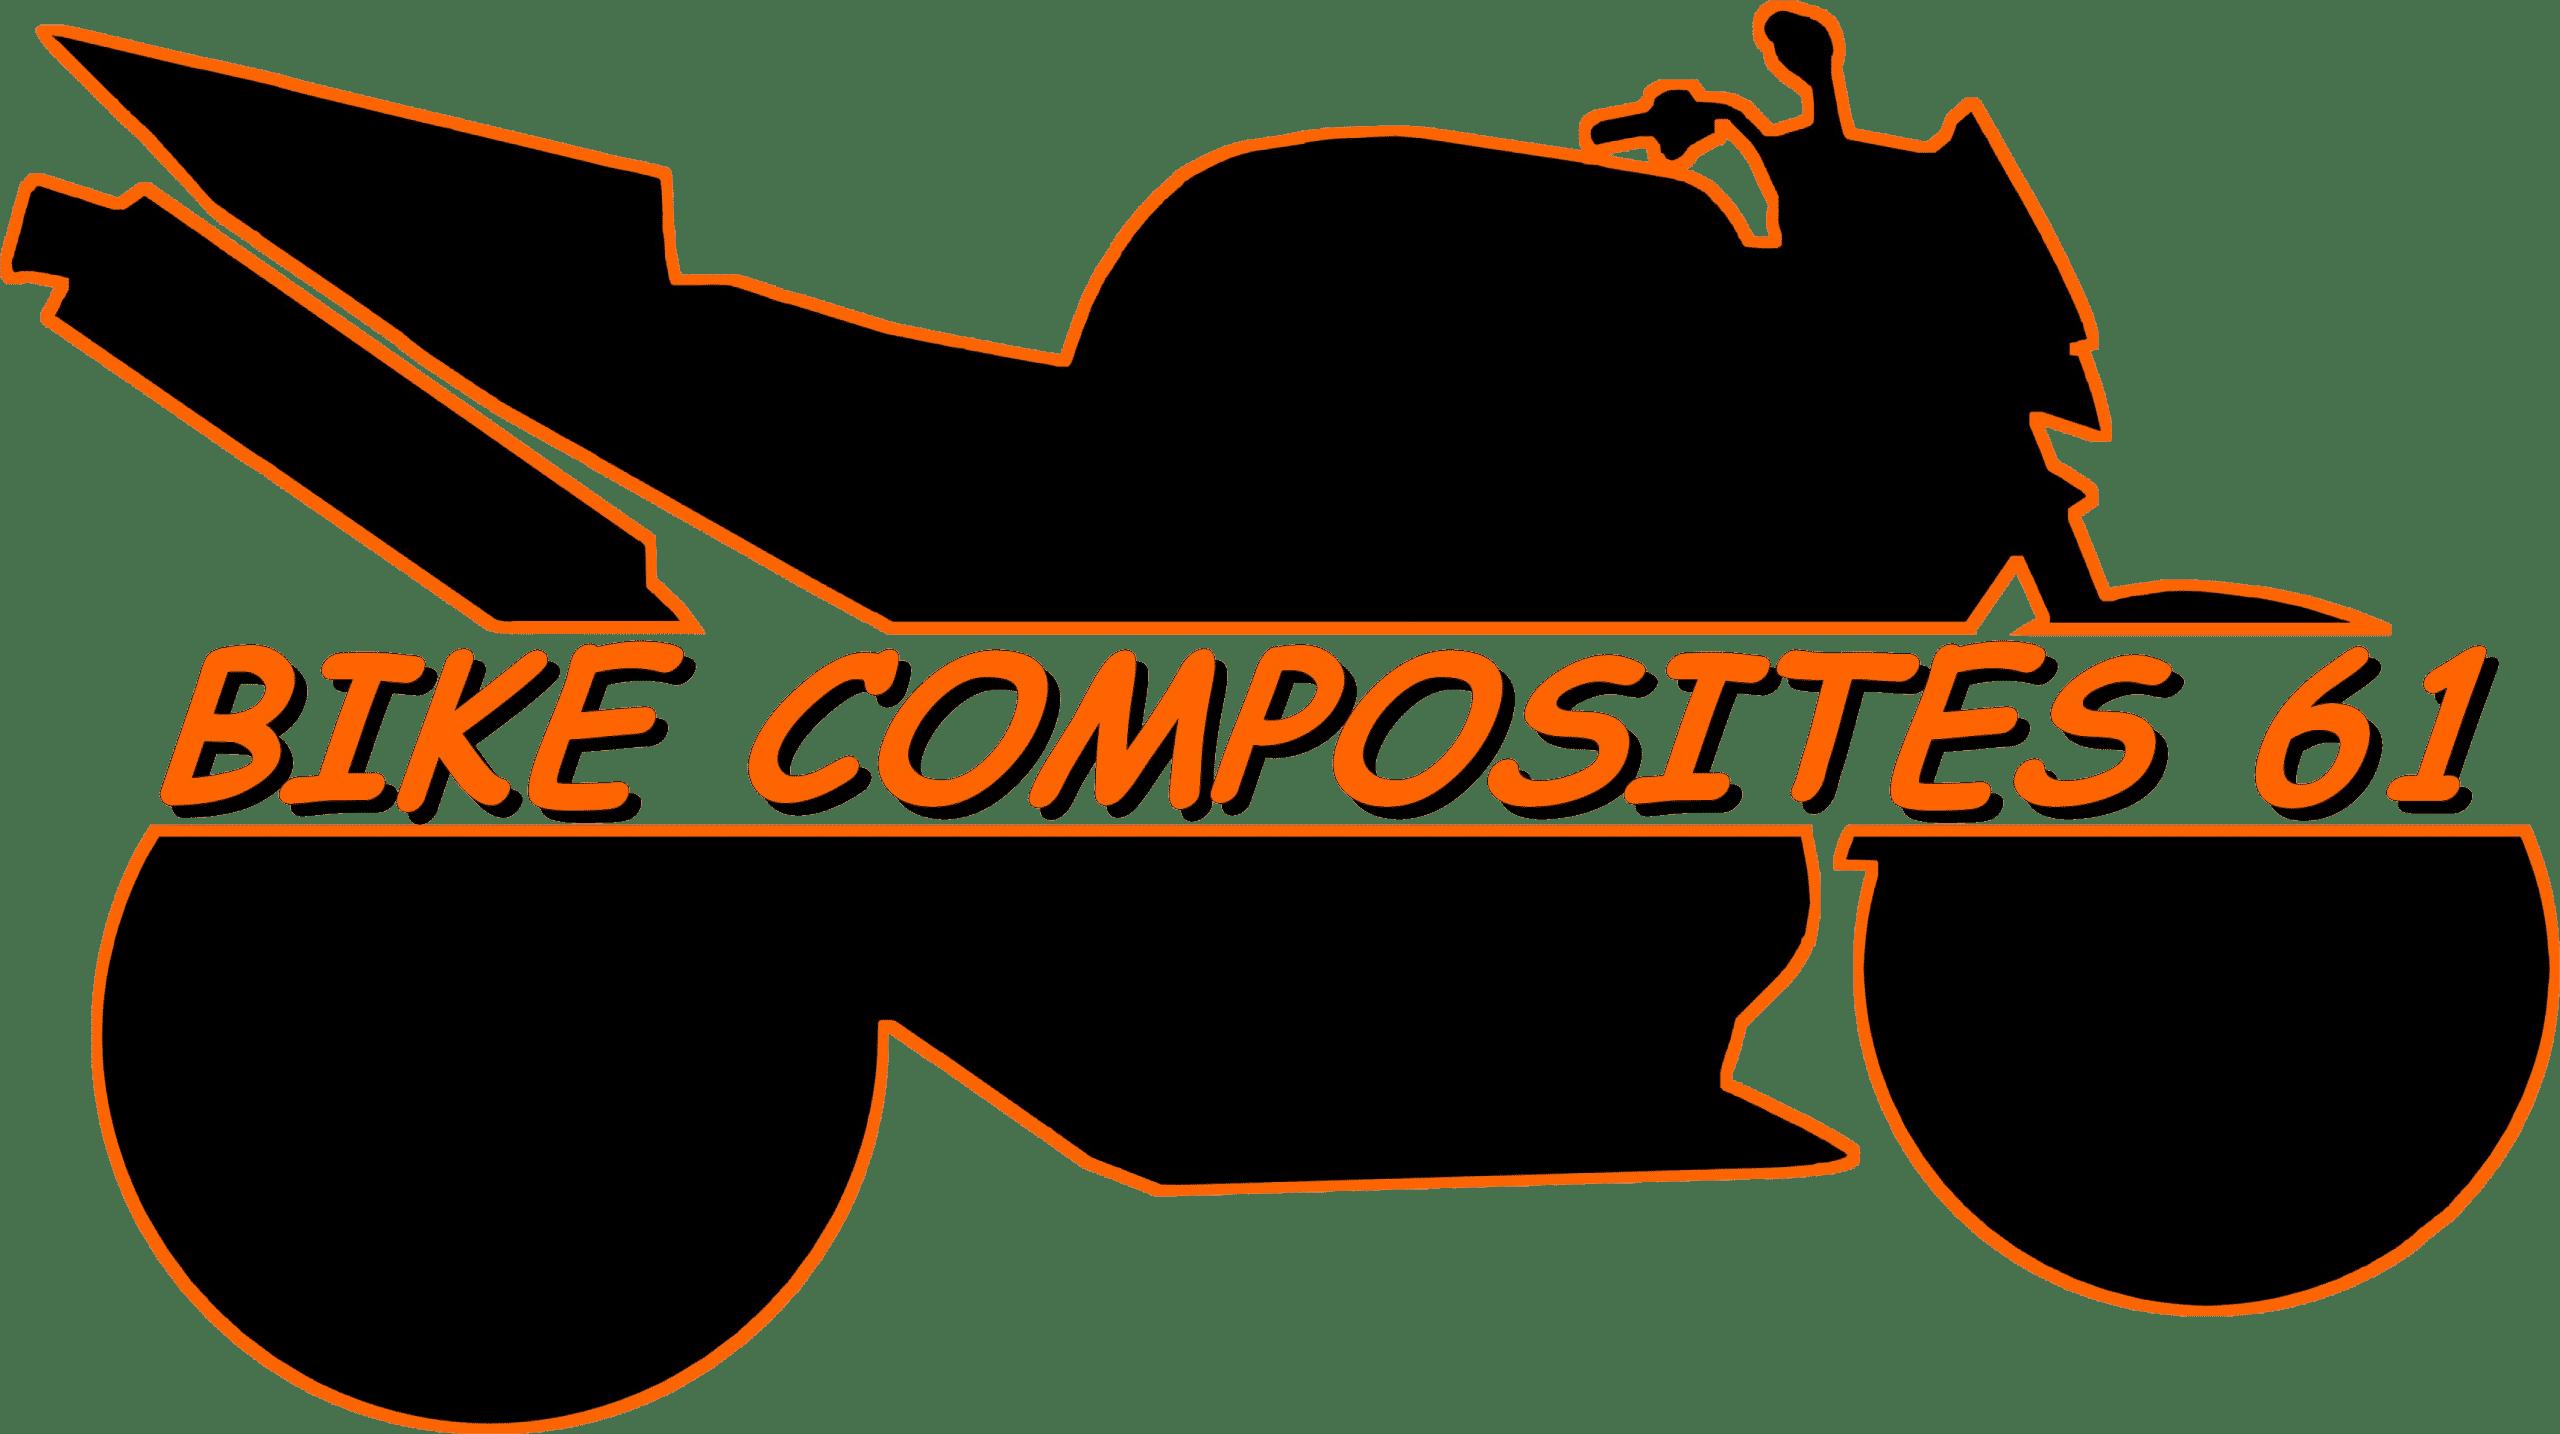 BIKE COMPOSITES 61